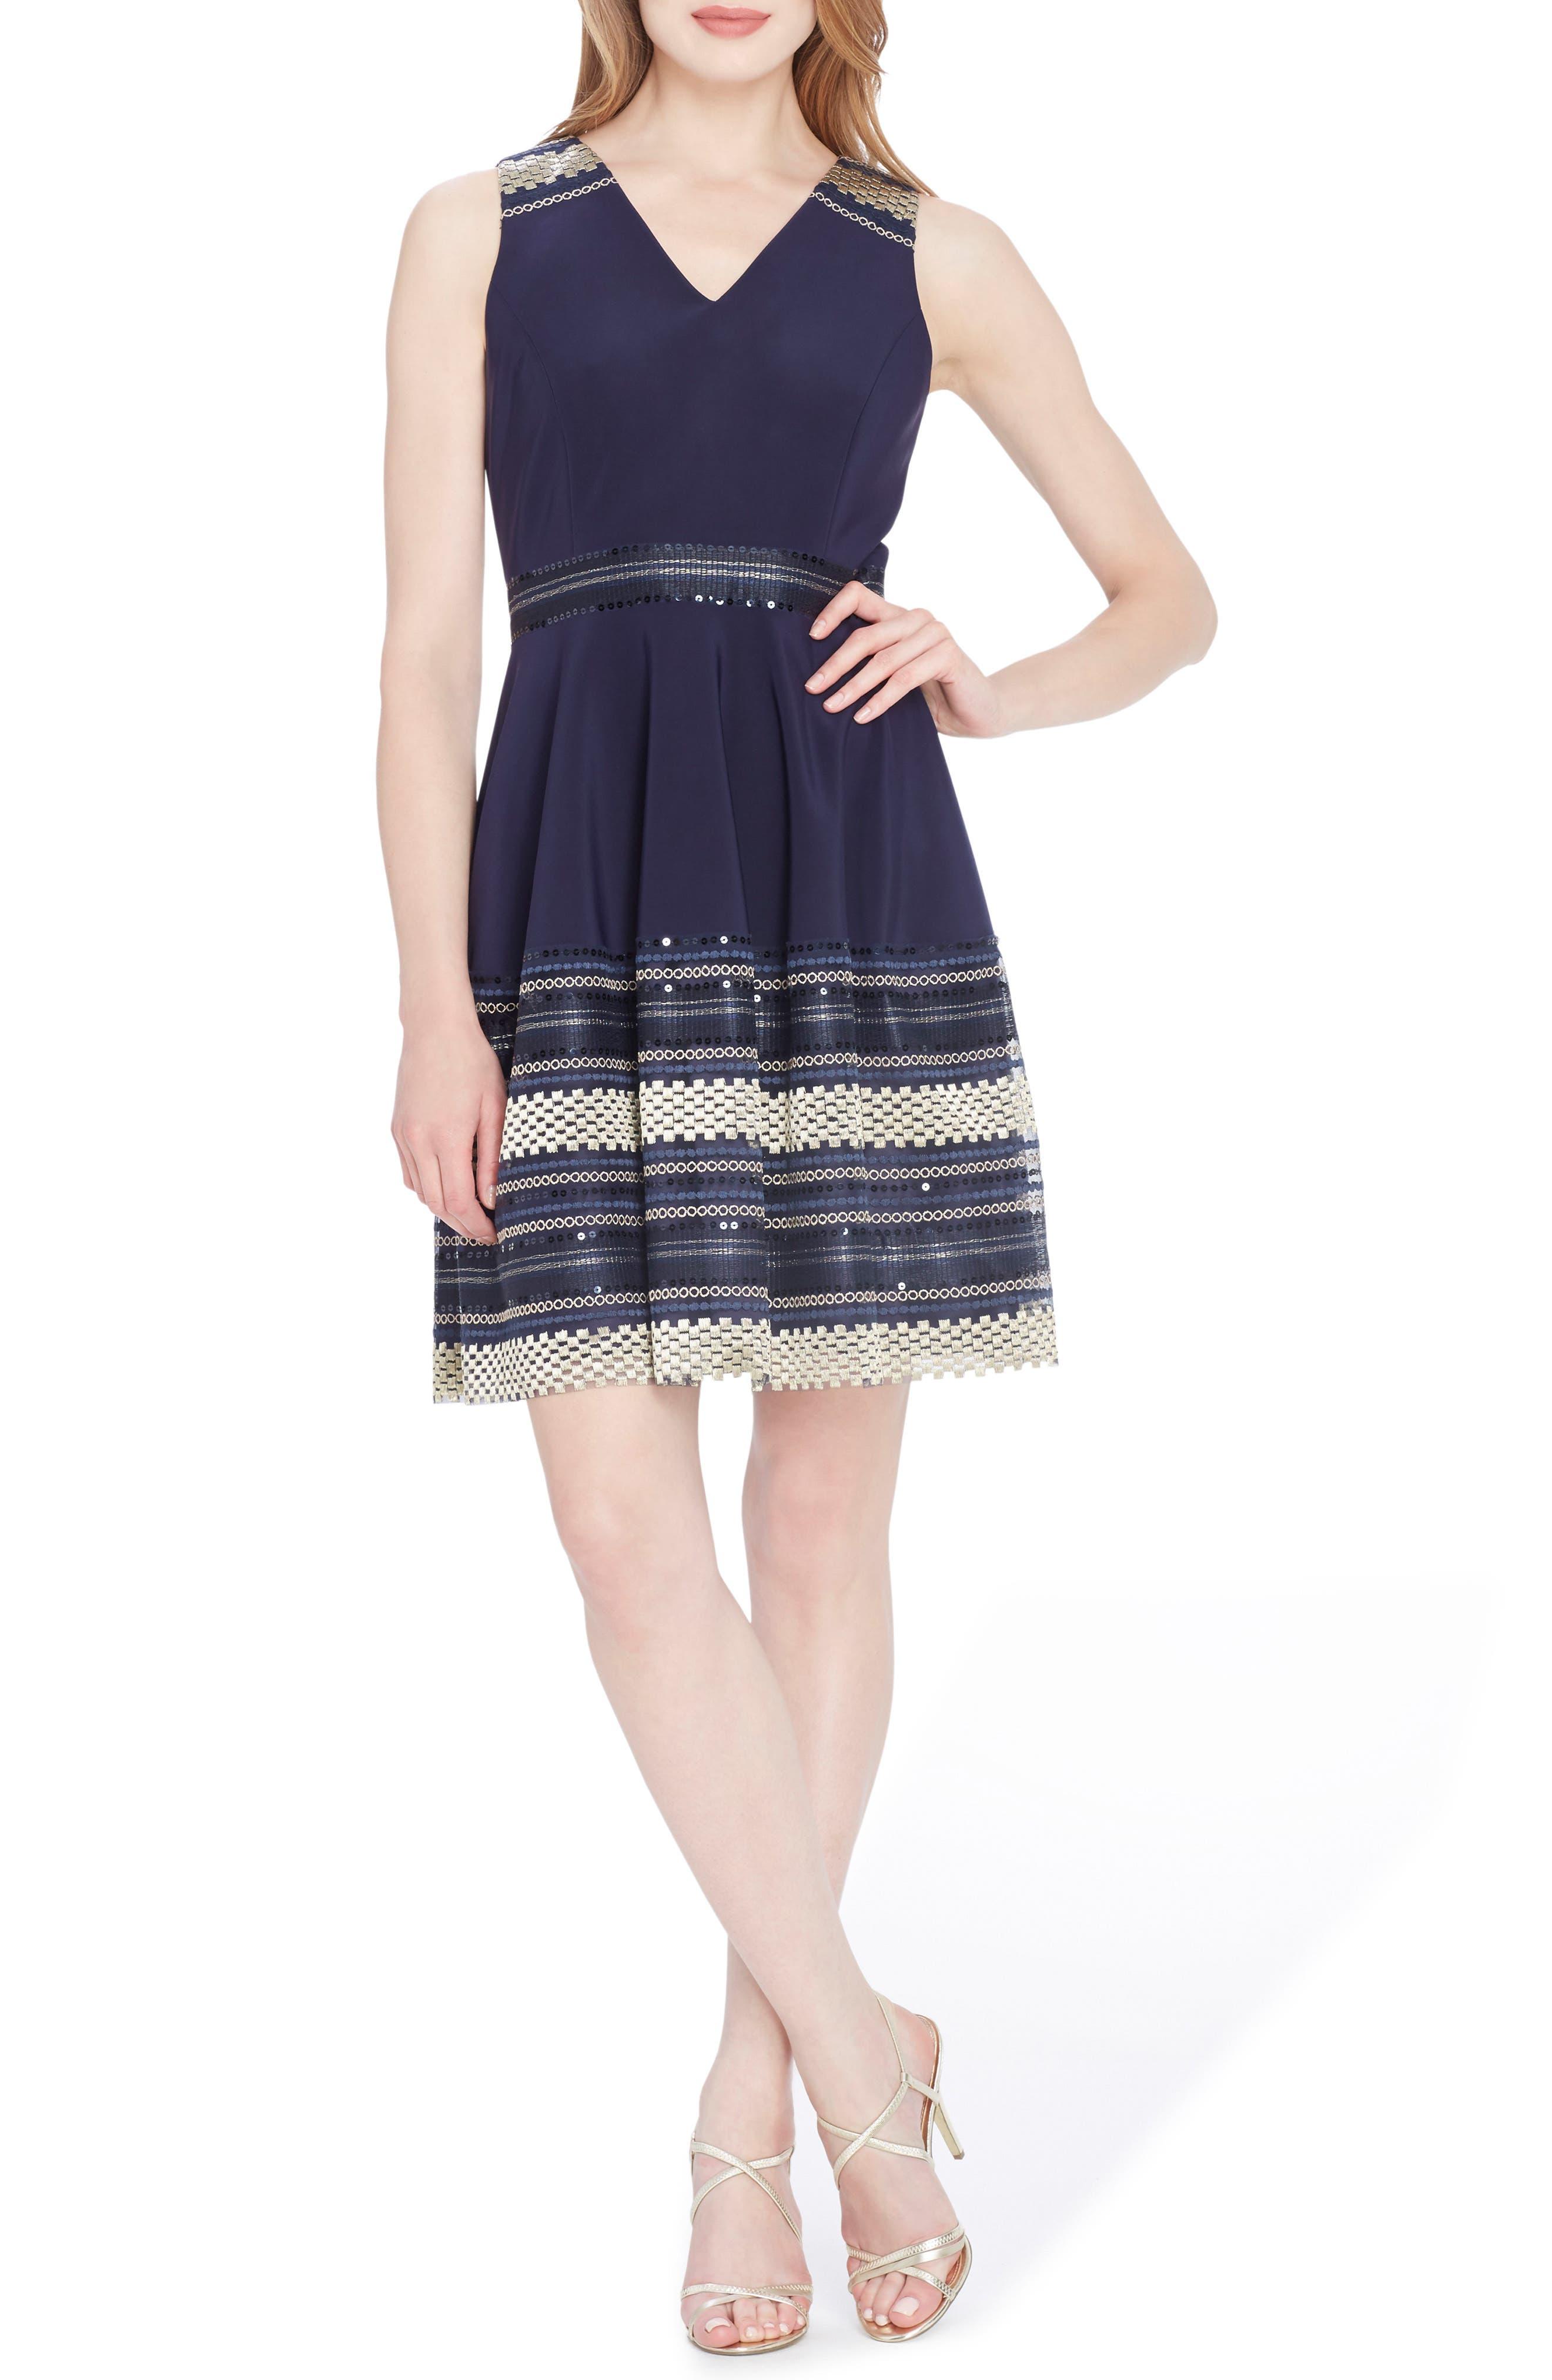 Alternate Image 1 Selected - Tahari Embroidered Fit & Flare Dress (Petite)